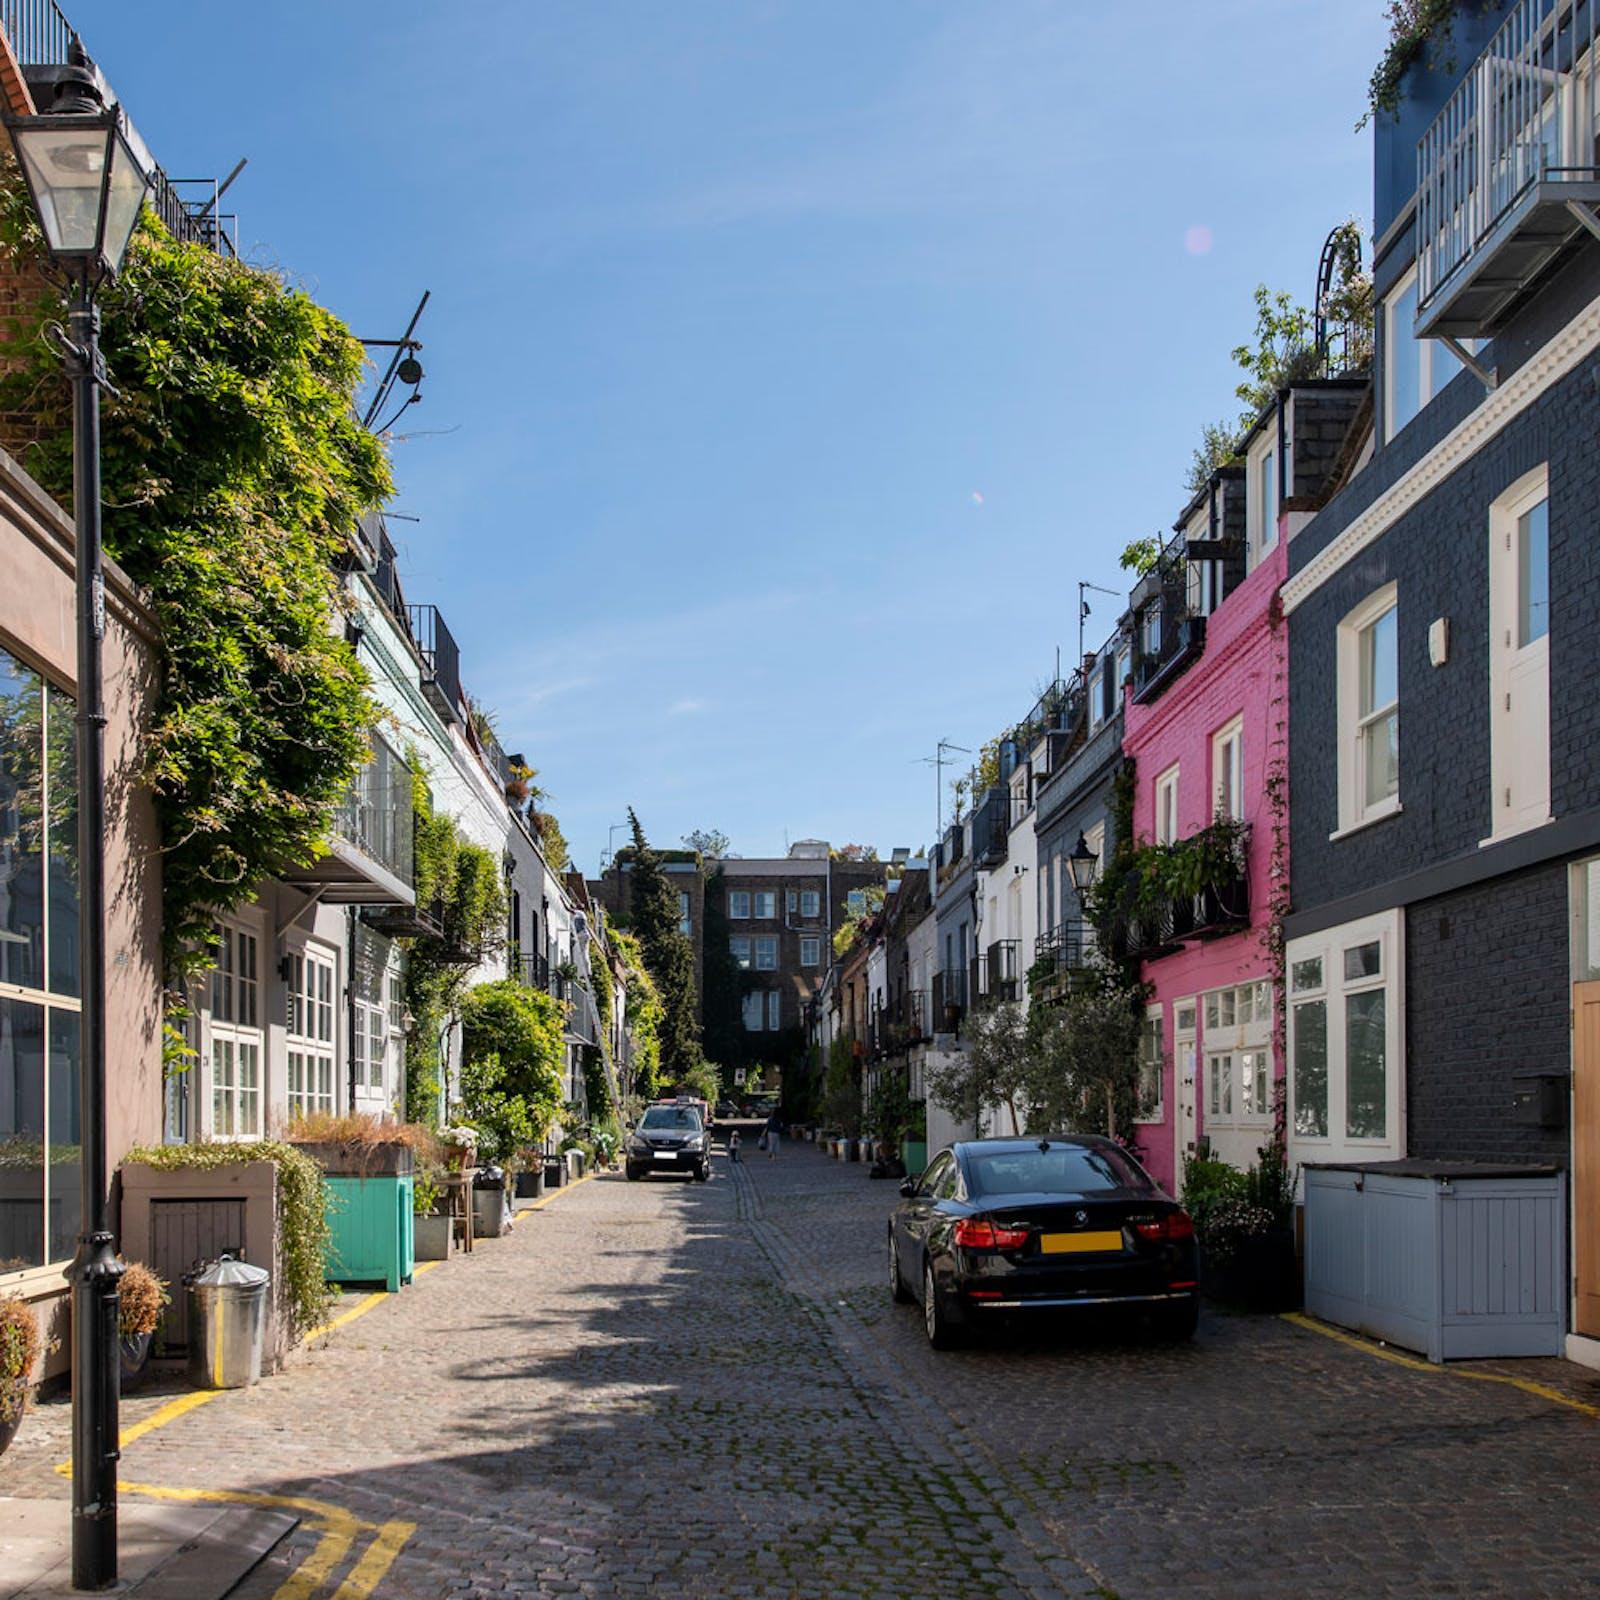 Mews street in Notting Hill London